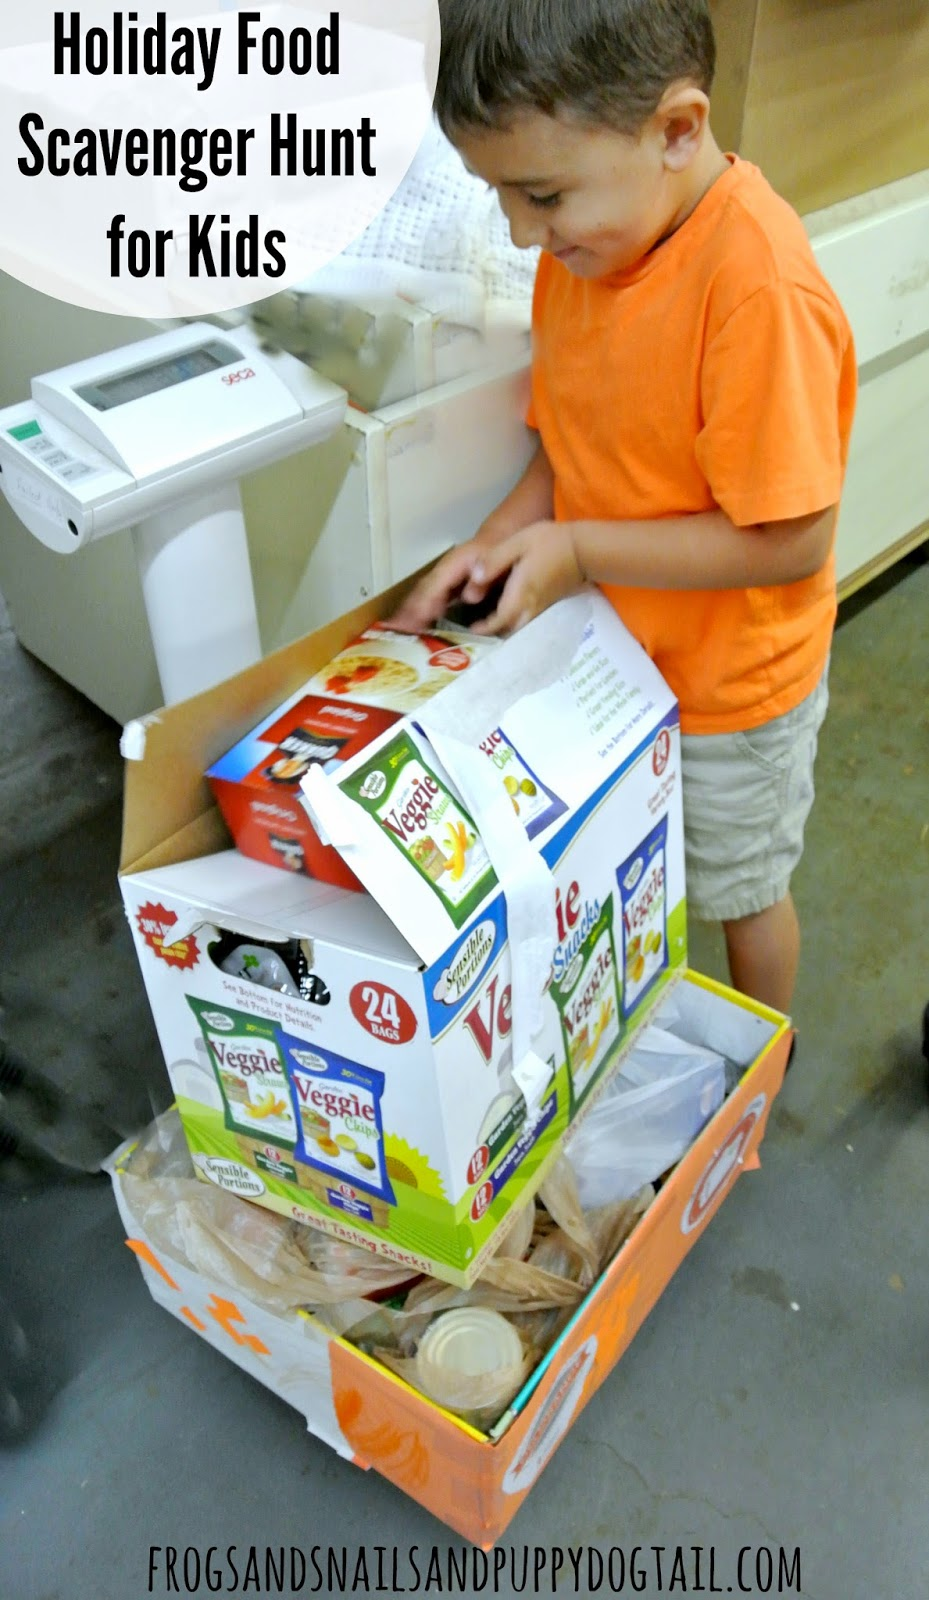 Holiday Food Scavenger Hunt for Kids with free printable on FSPDT